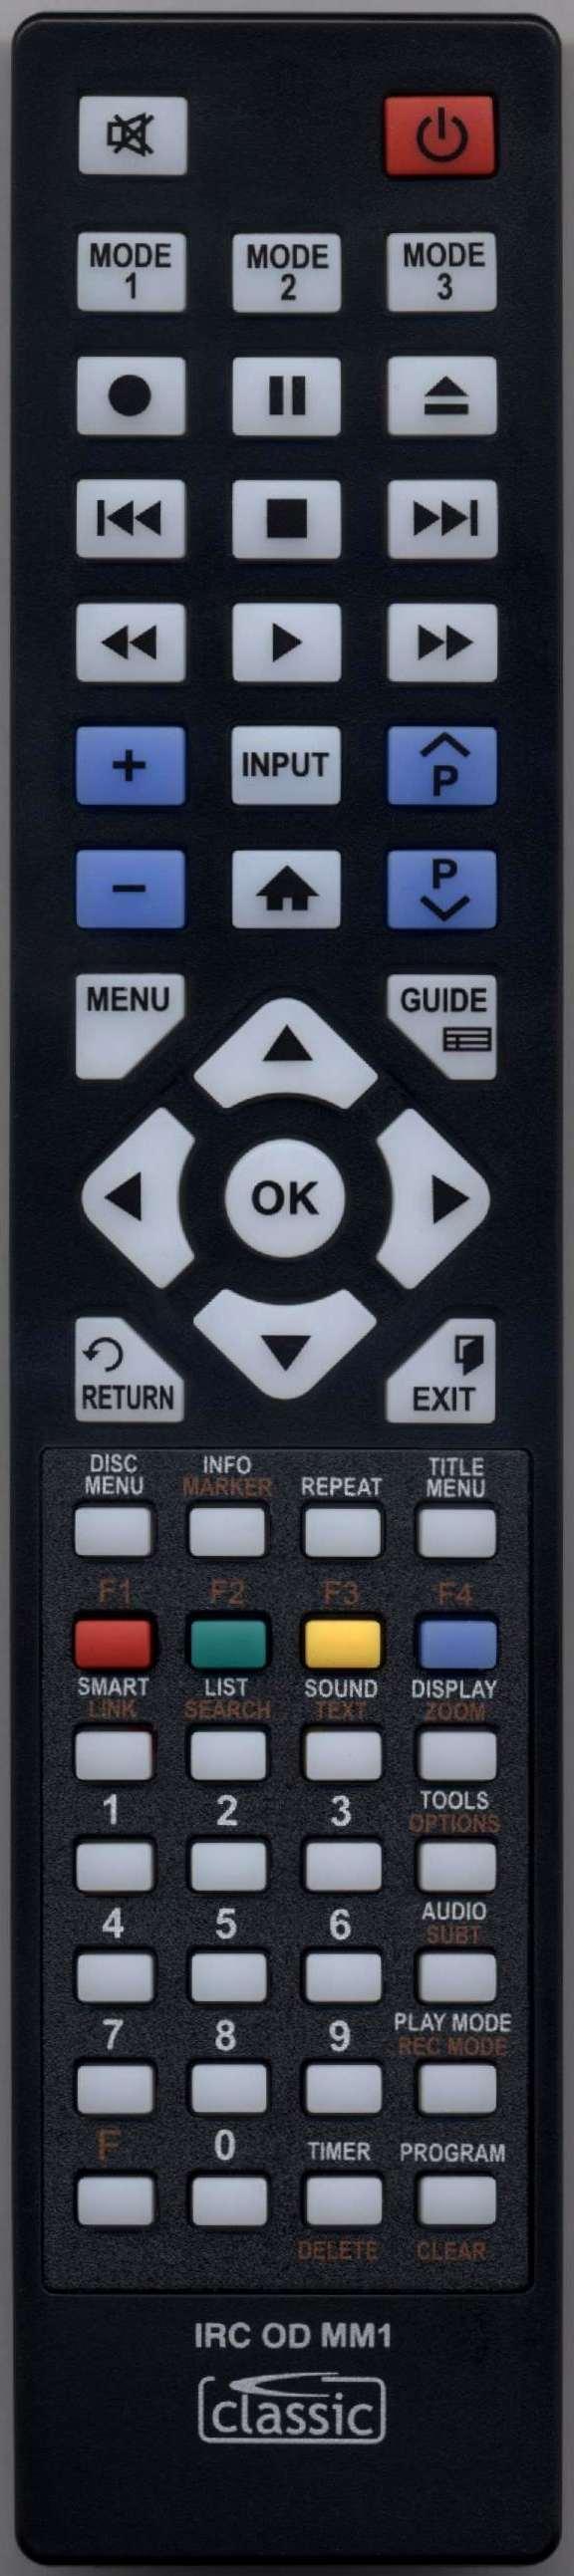 Samsung AK59-00139A Remote Control Alternative